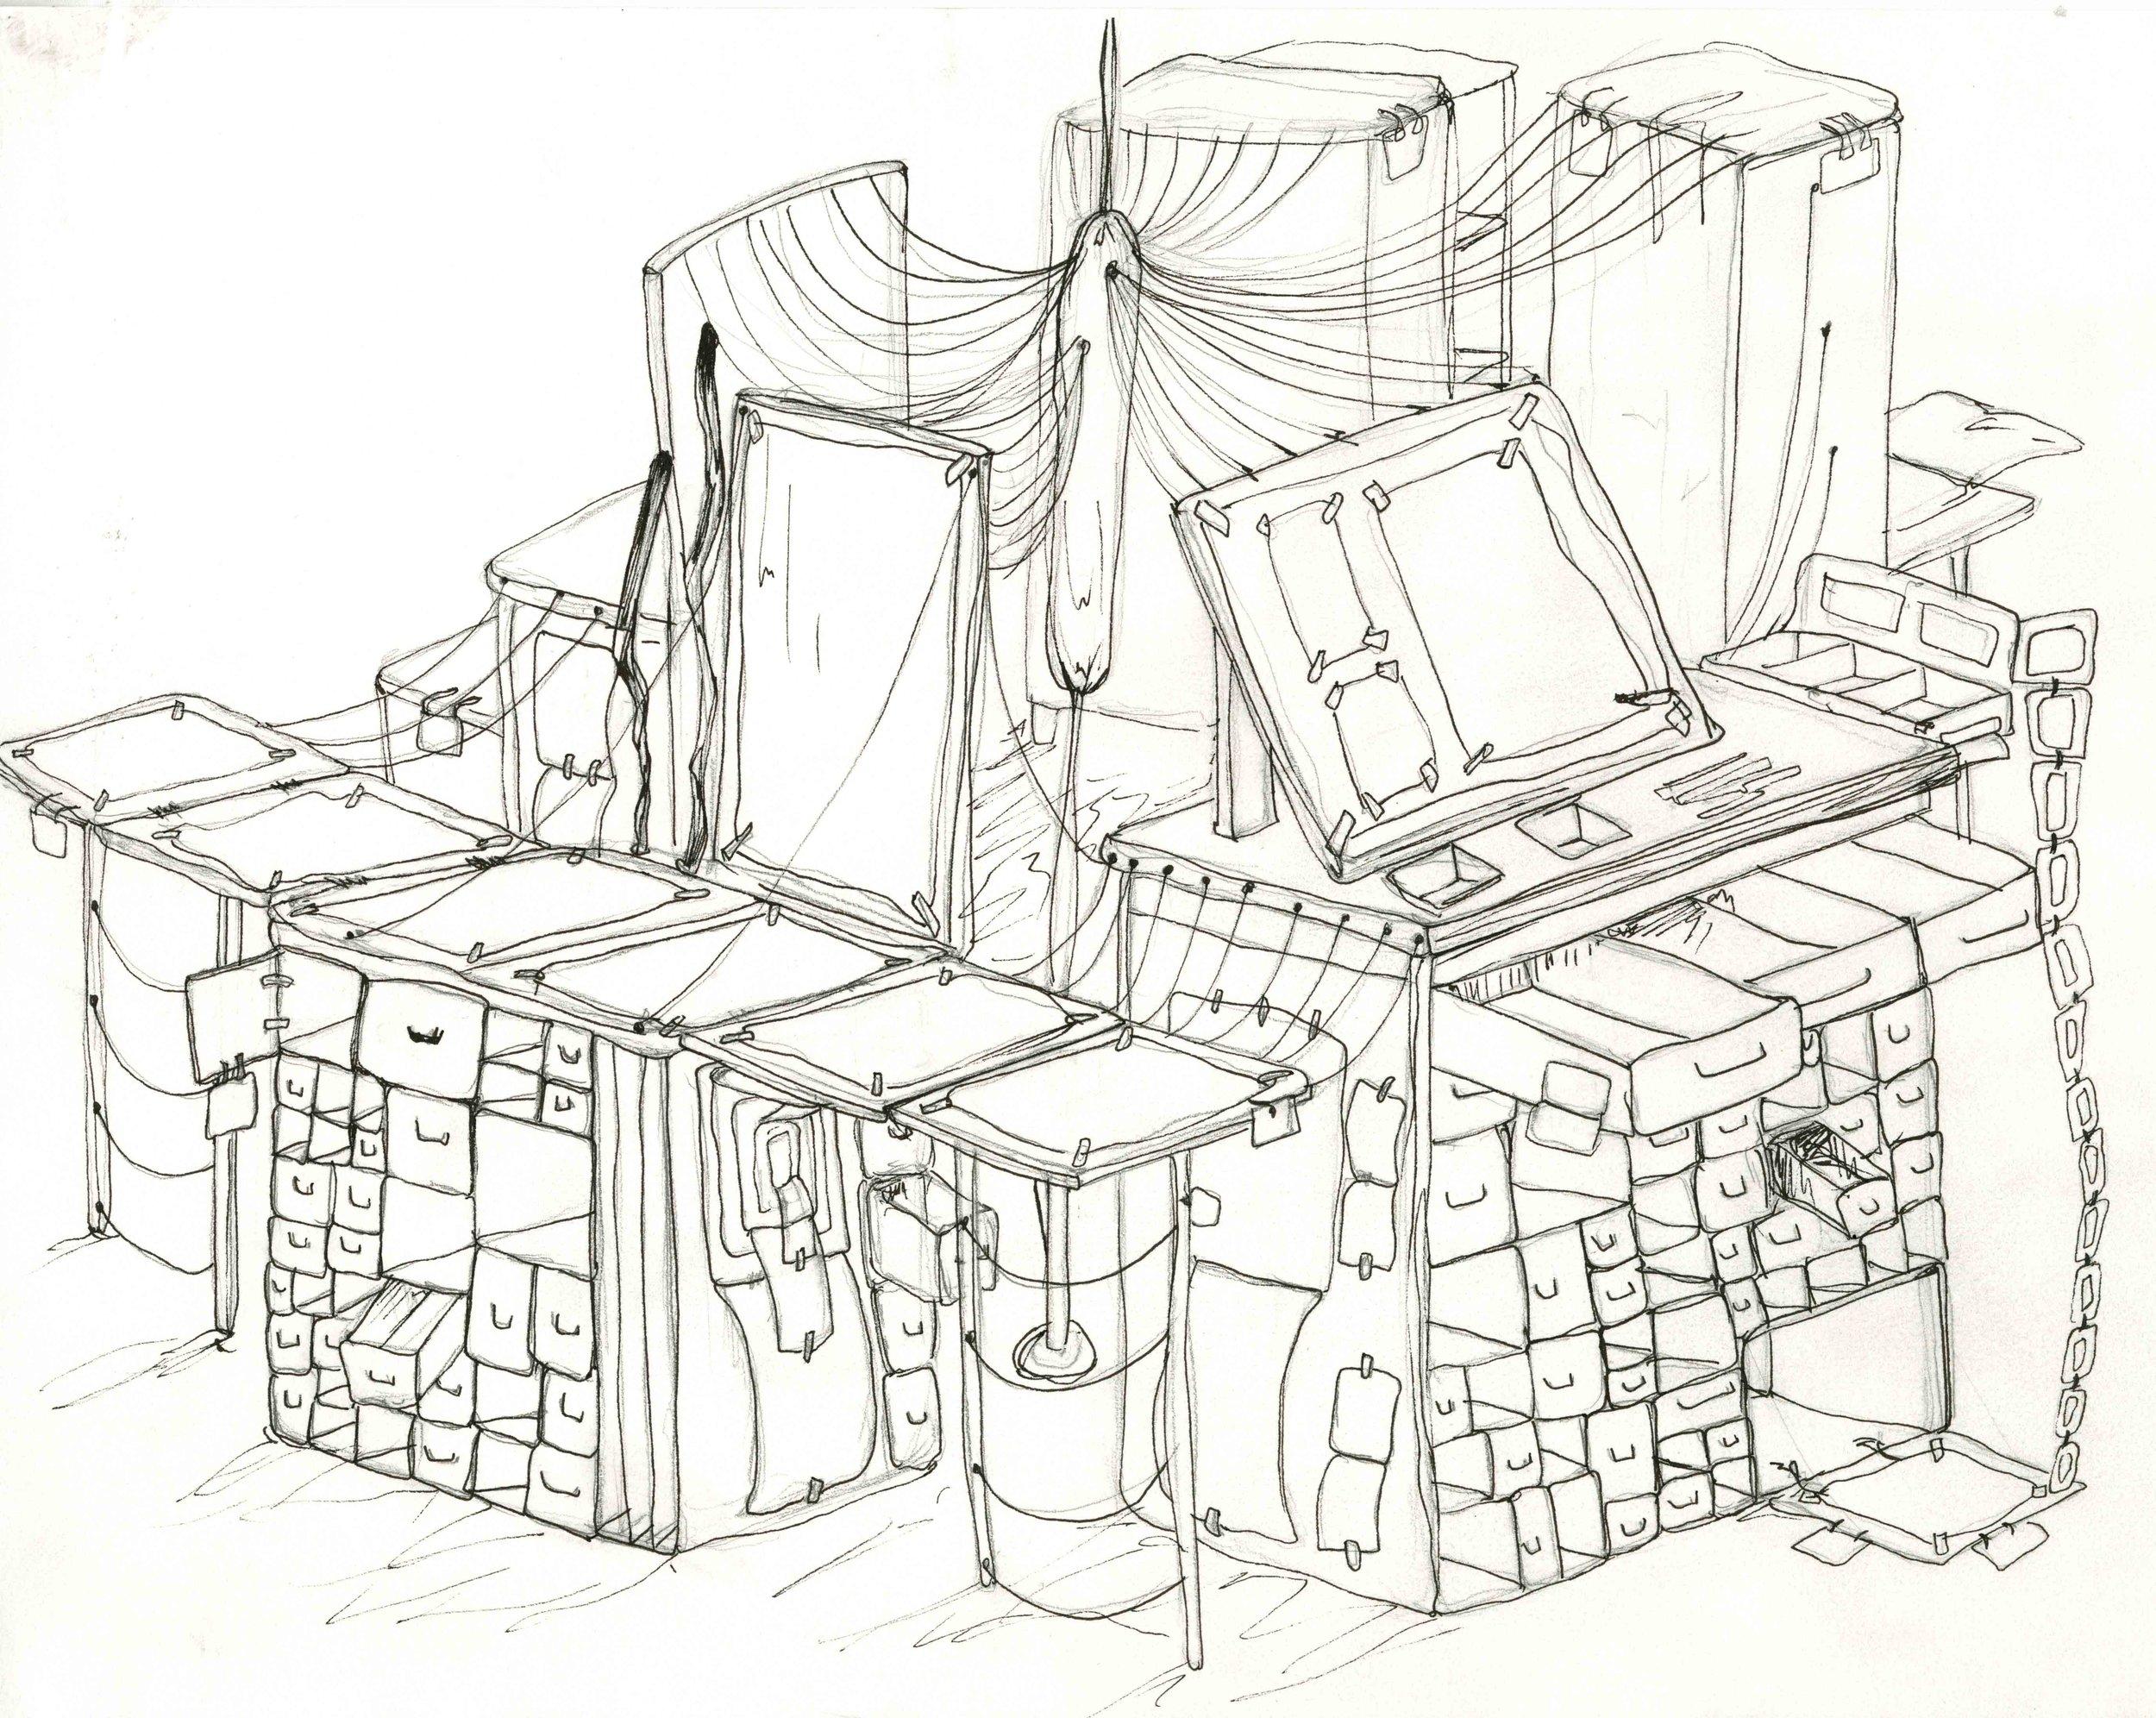 Cabinet_1_small.jpg